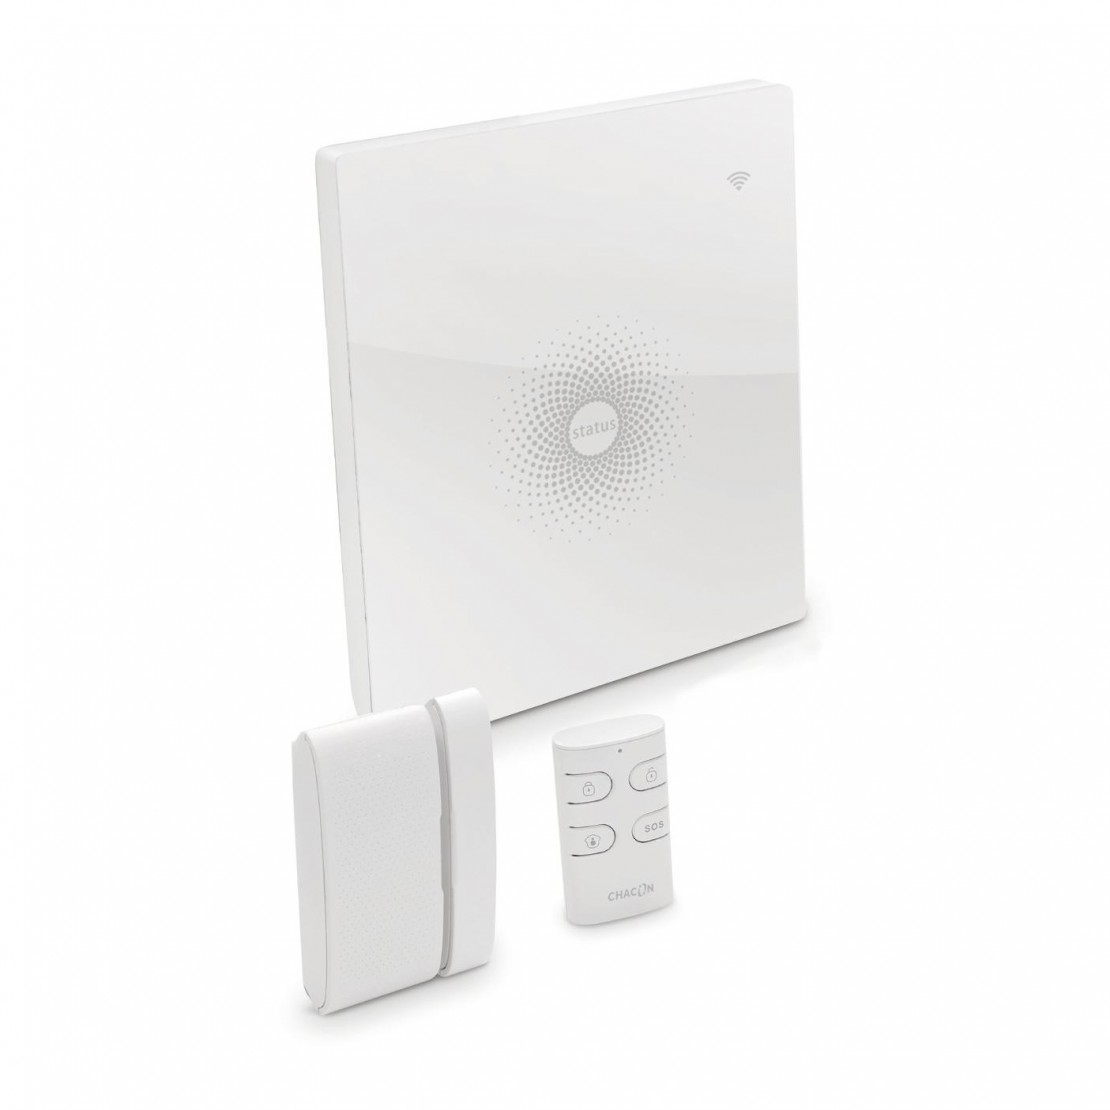 Système d'alarme Wi-Fi sans fil tactile